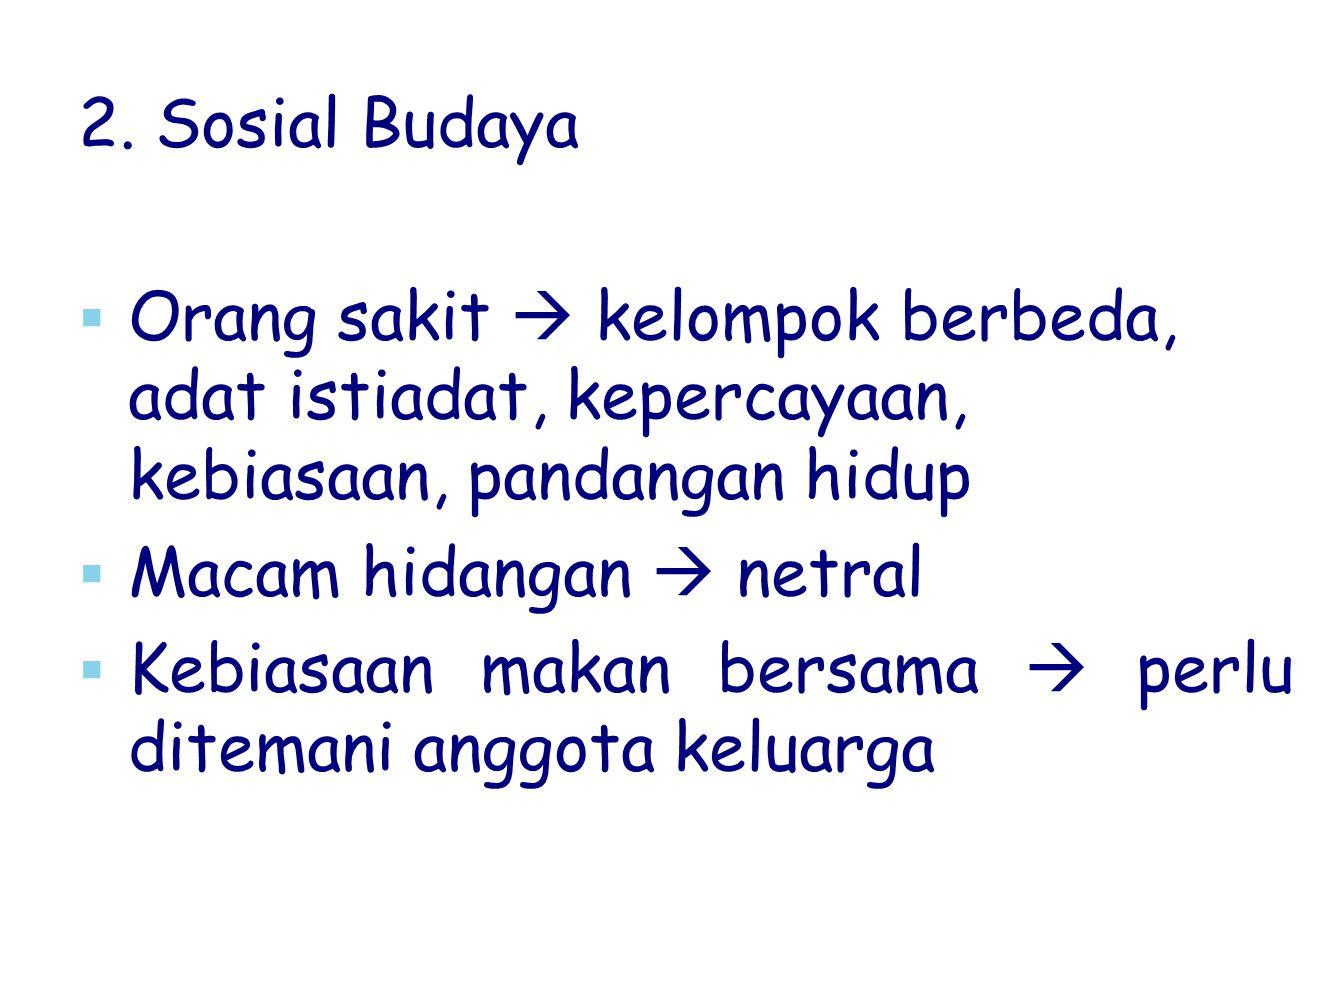 2. Sosial Budaya Orang sakit  kelompok berbeda, adat istiadat, kepercayaan, kebiasaan, pandangan hidup.